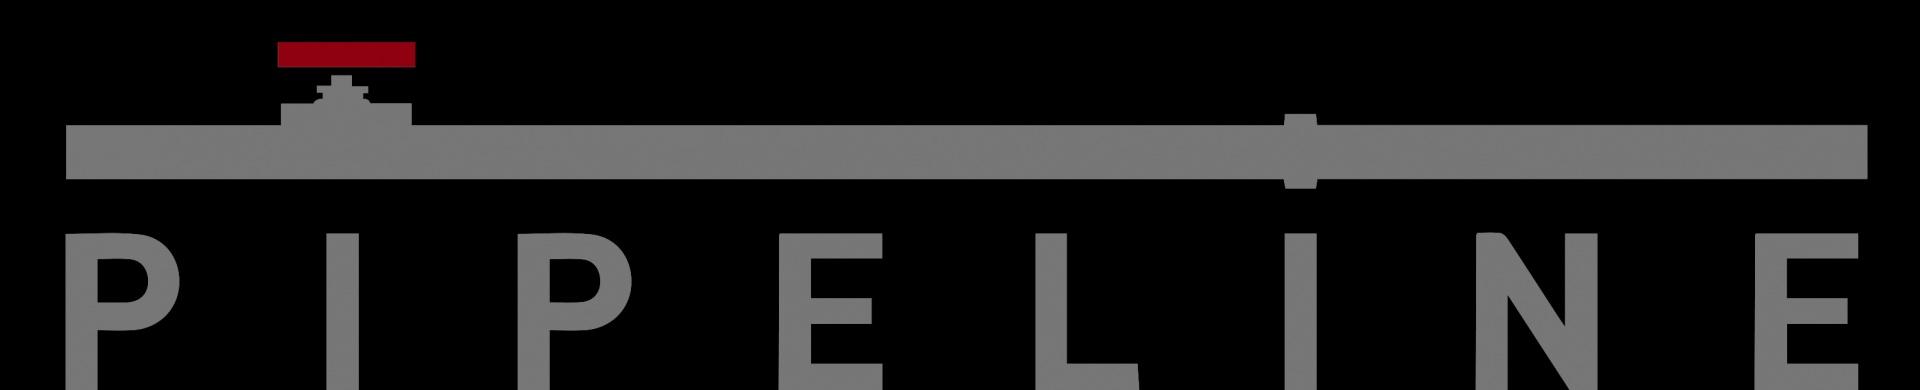 logo_final_gray